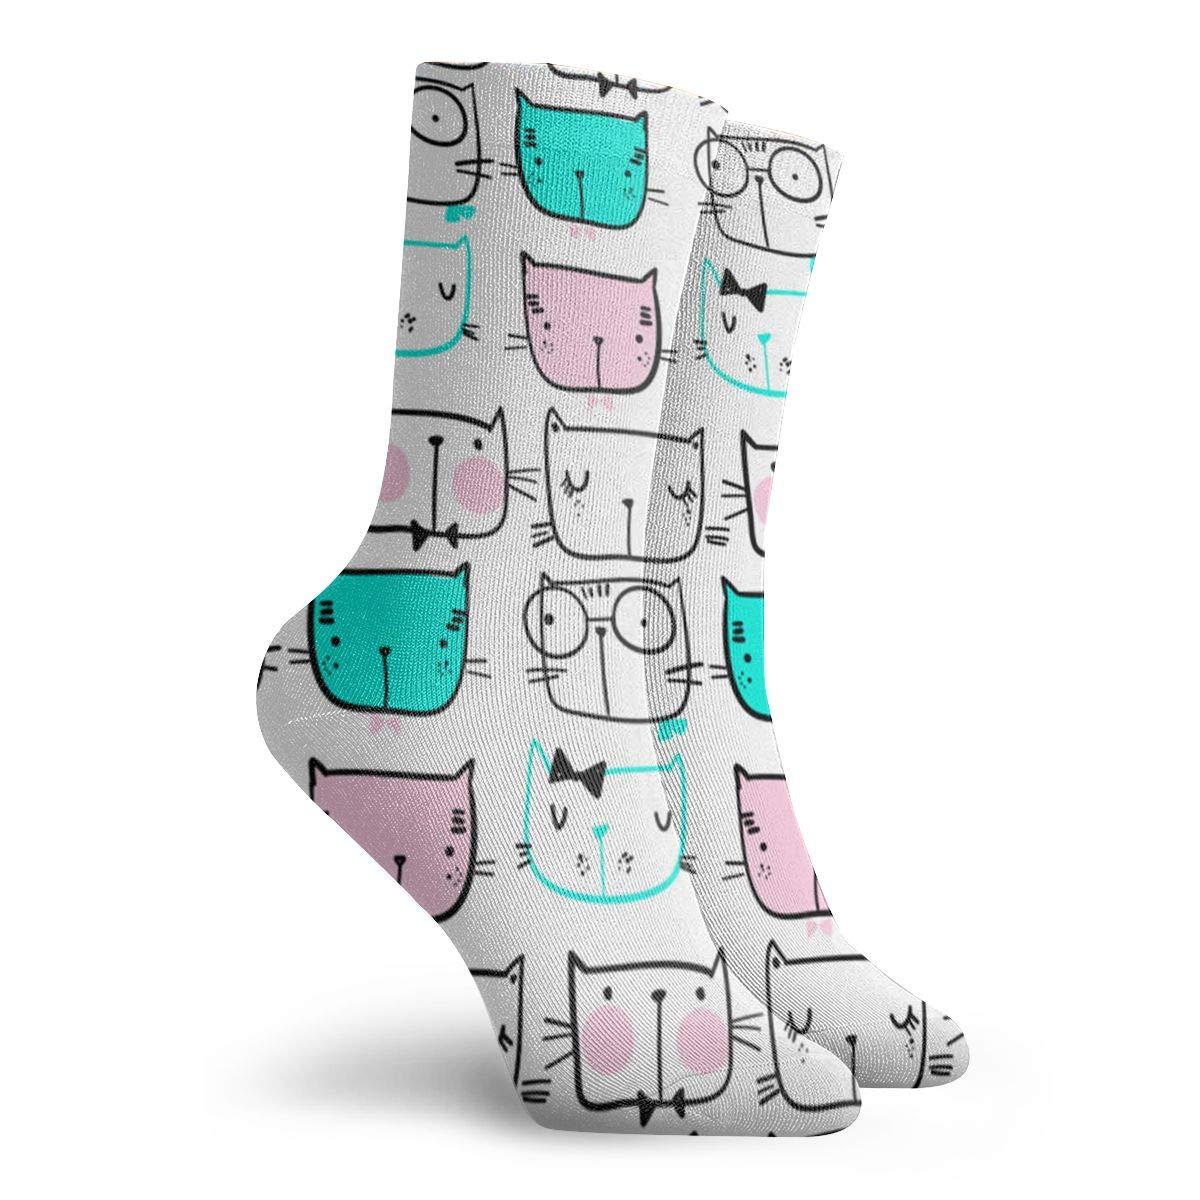 Hand Drawn Cat Unisex Funny Casual Crew Socks Athletic Socks For Boys Girls Kids Teenagers